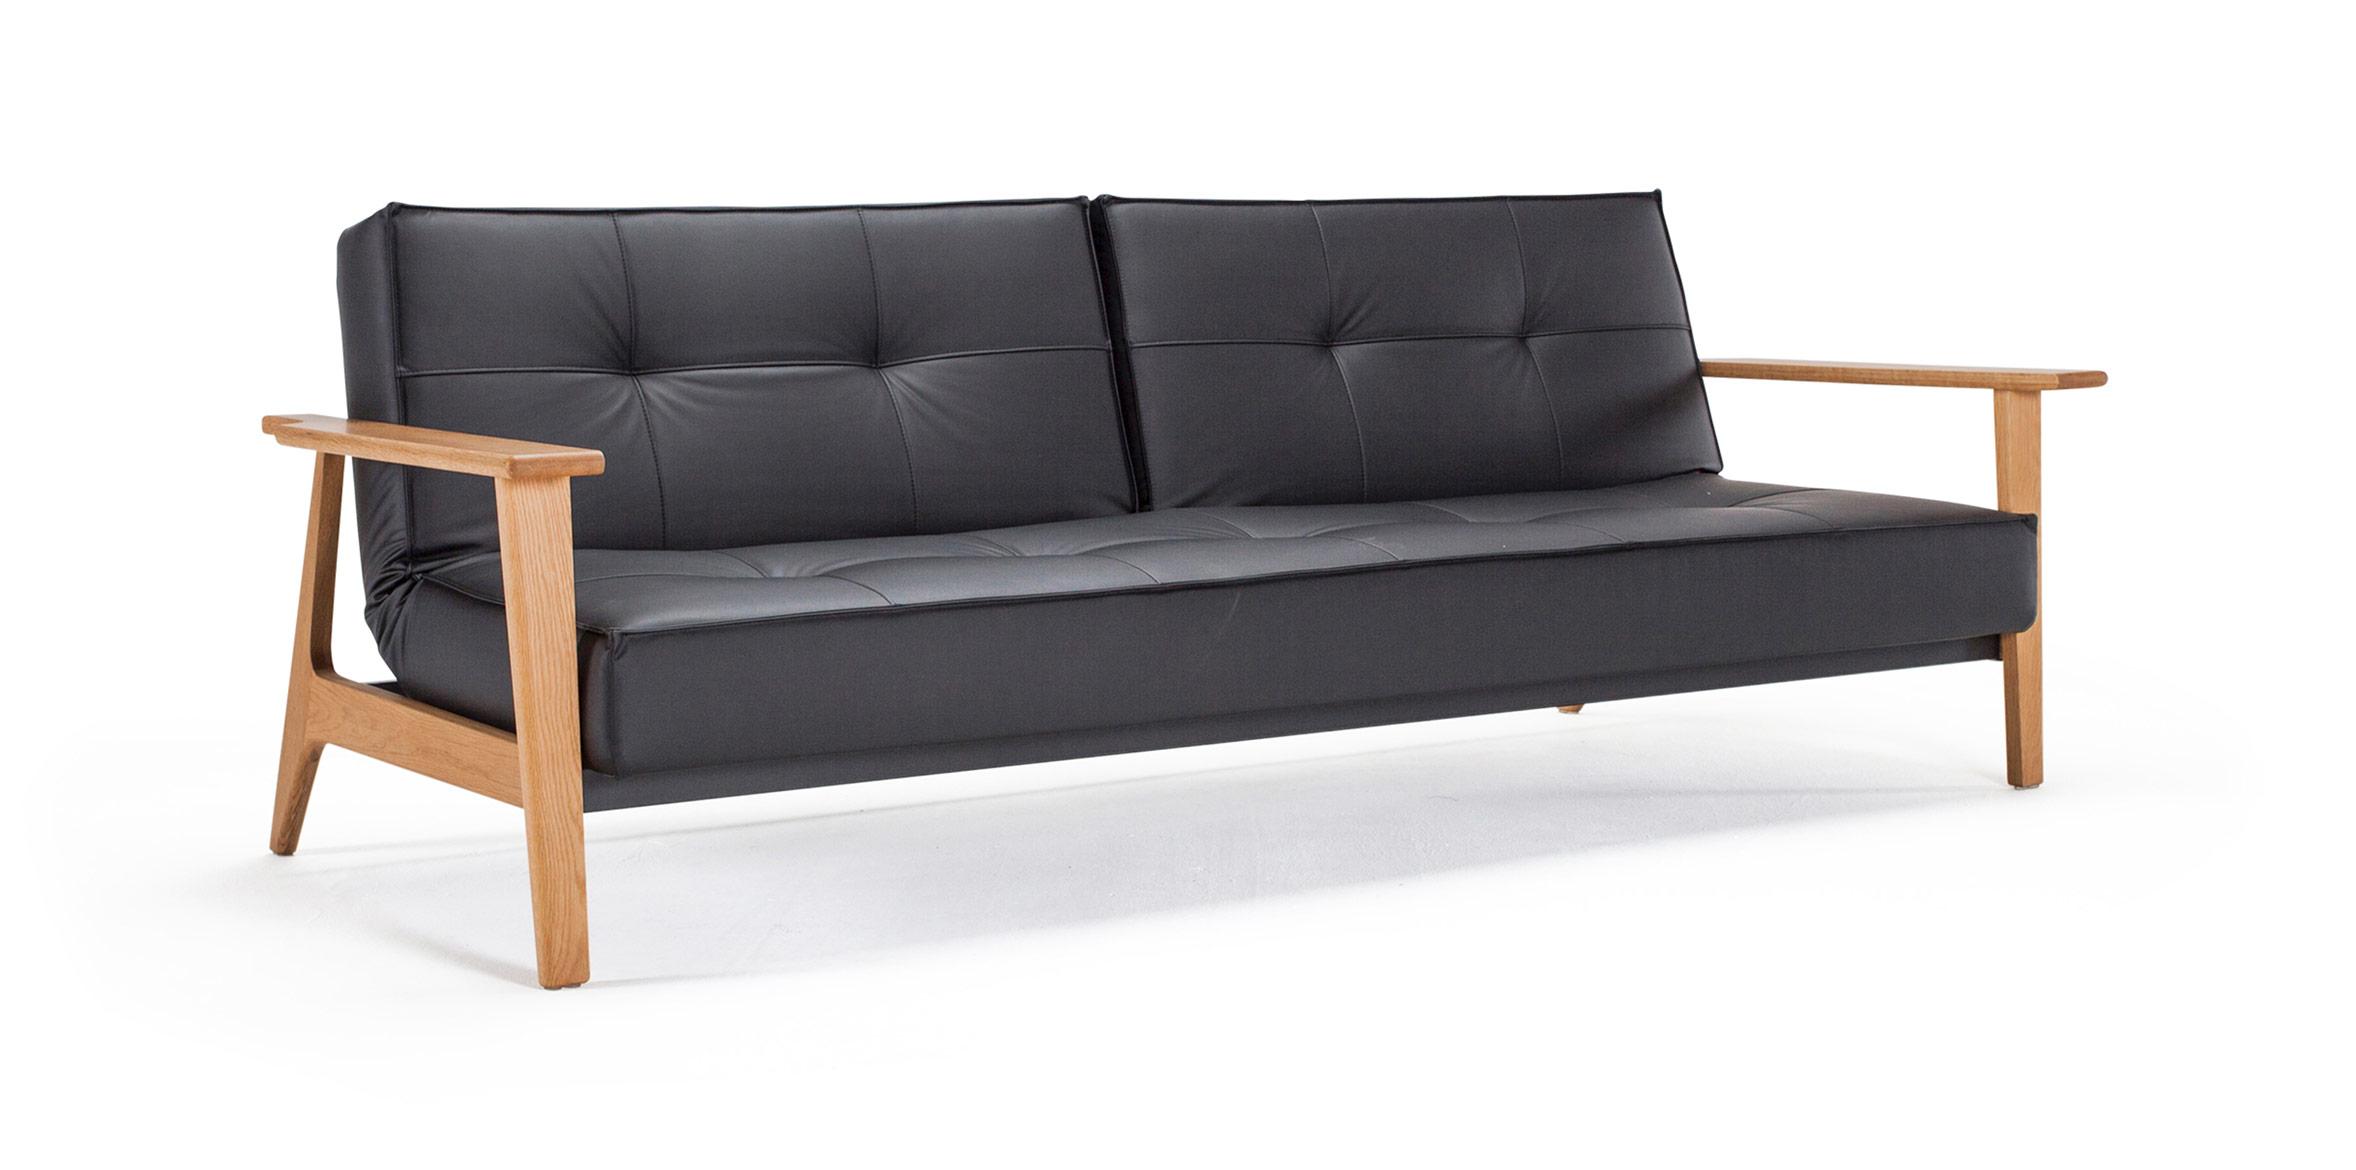 Frej sofa hip furniture for Hip furniture